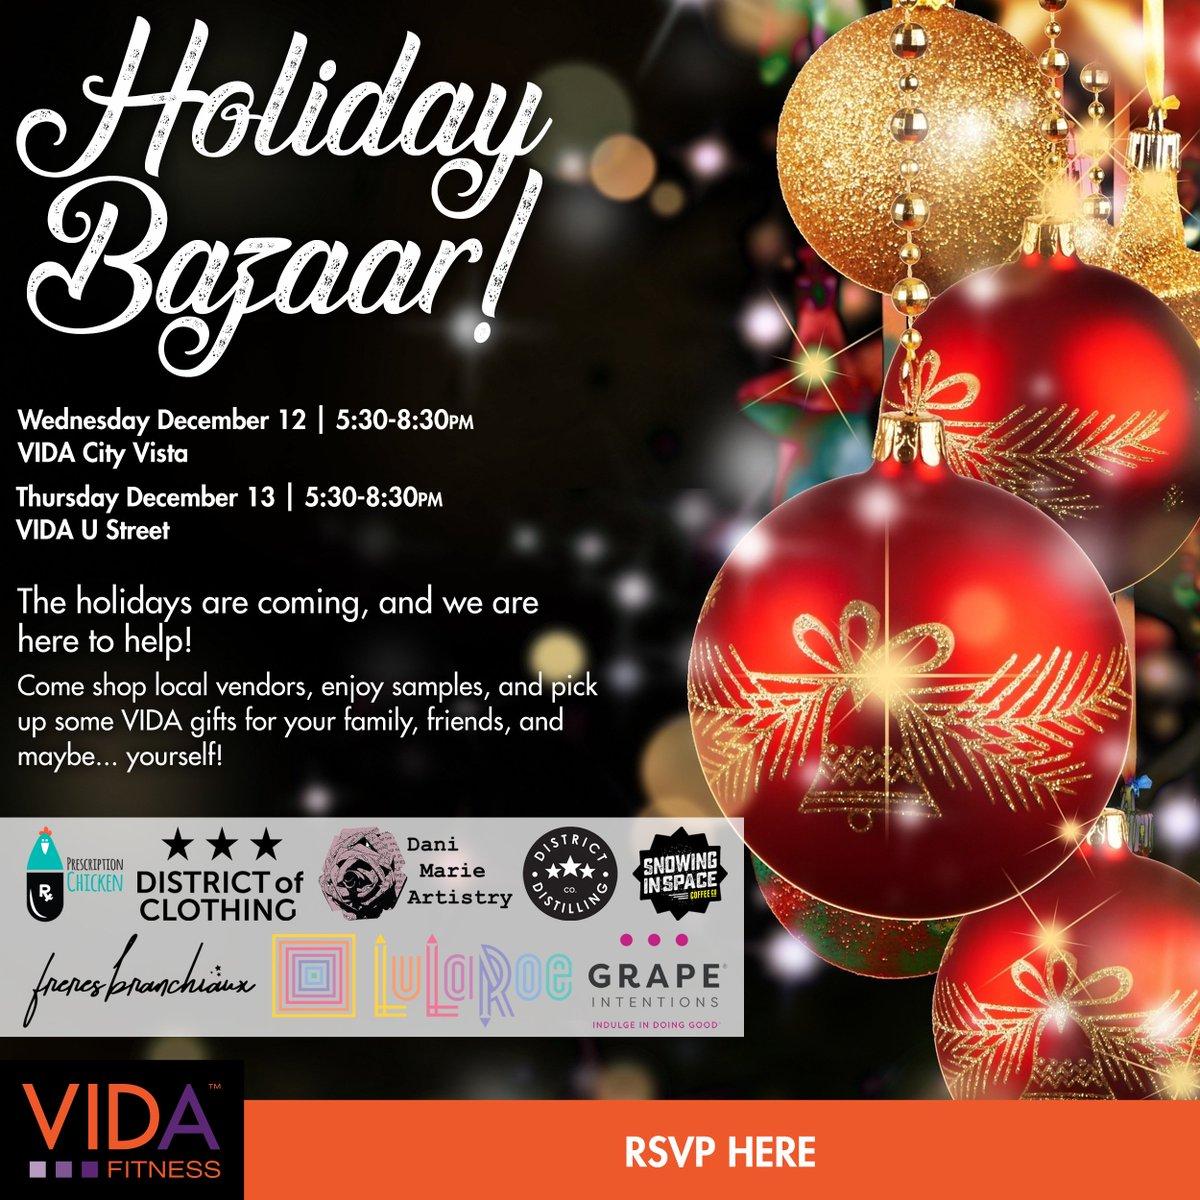 Vida Fitness On Twitter Missed Last Nights Holiday Bazaar Fun At